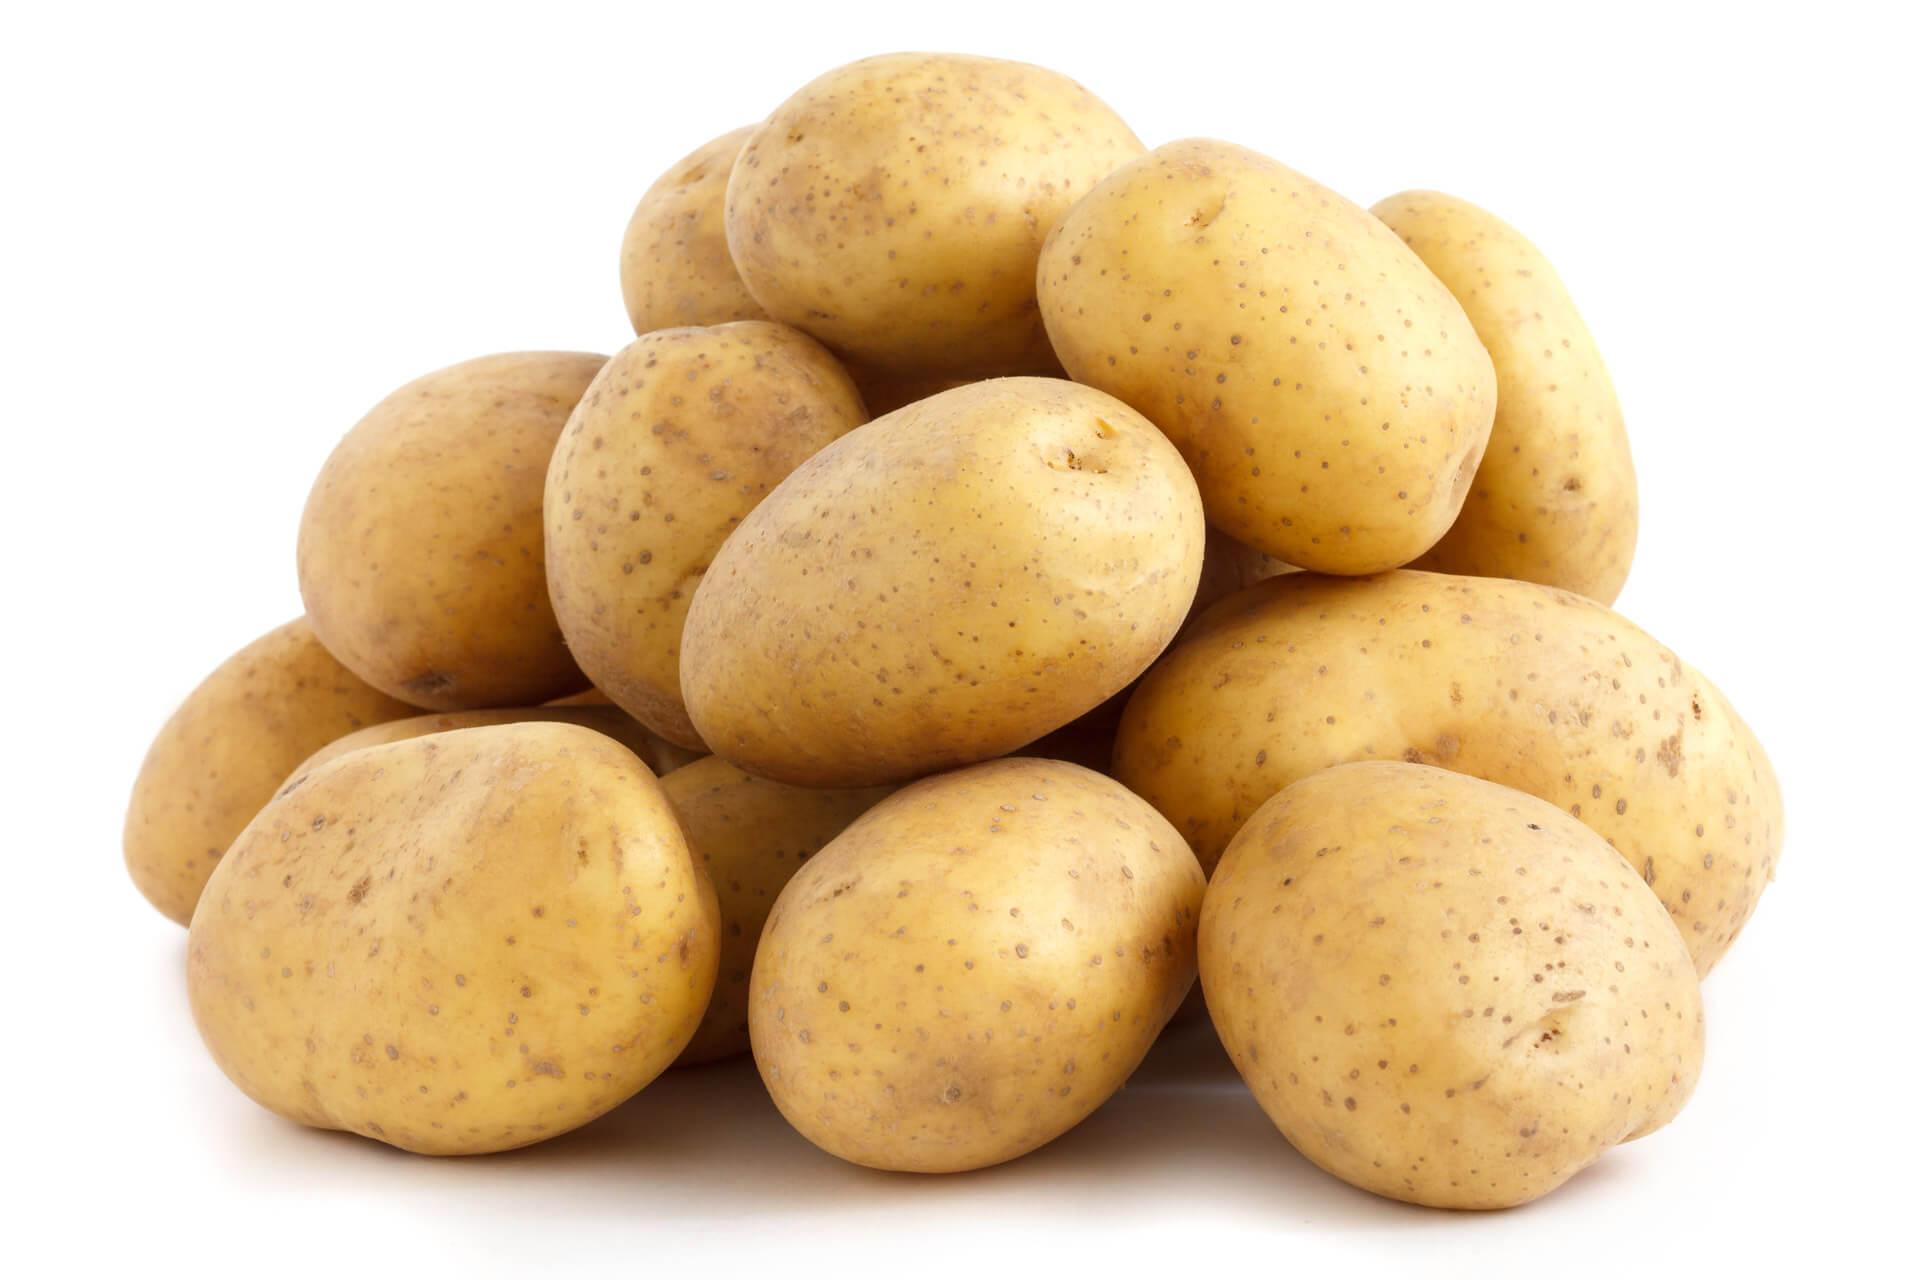 Potato Pics, Food Collection